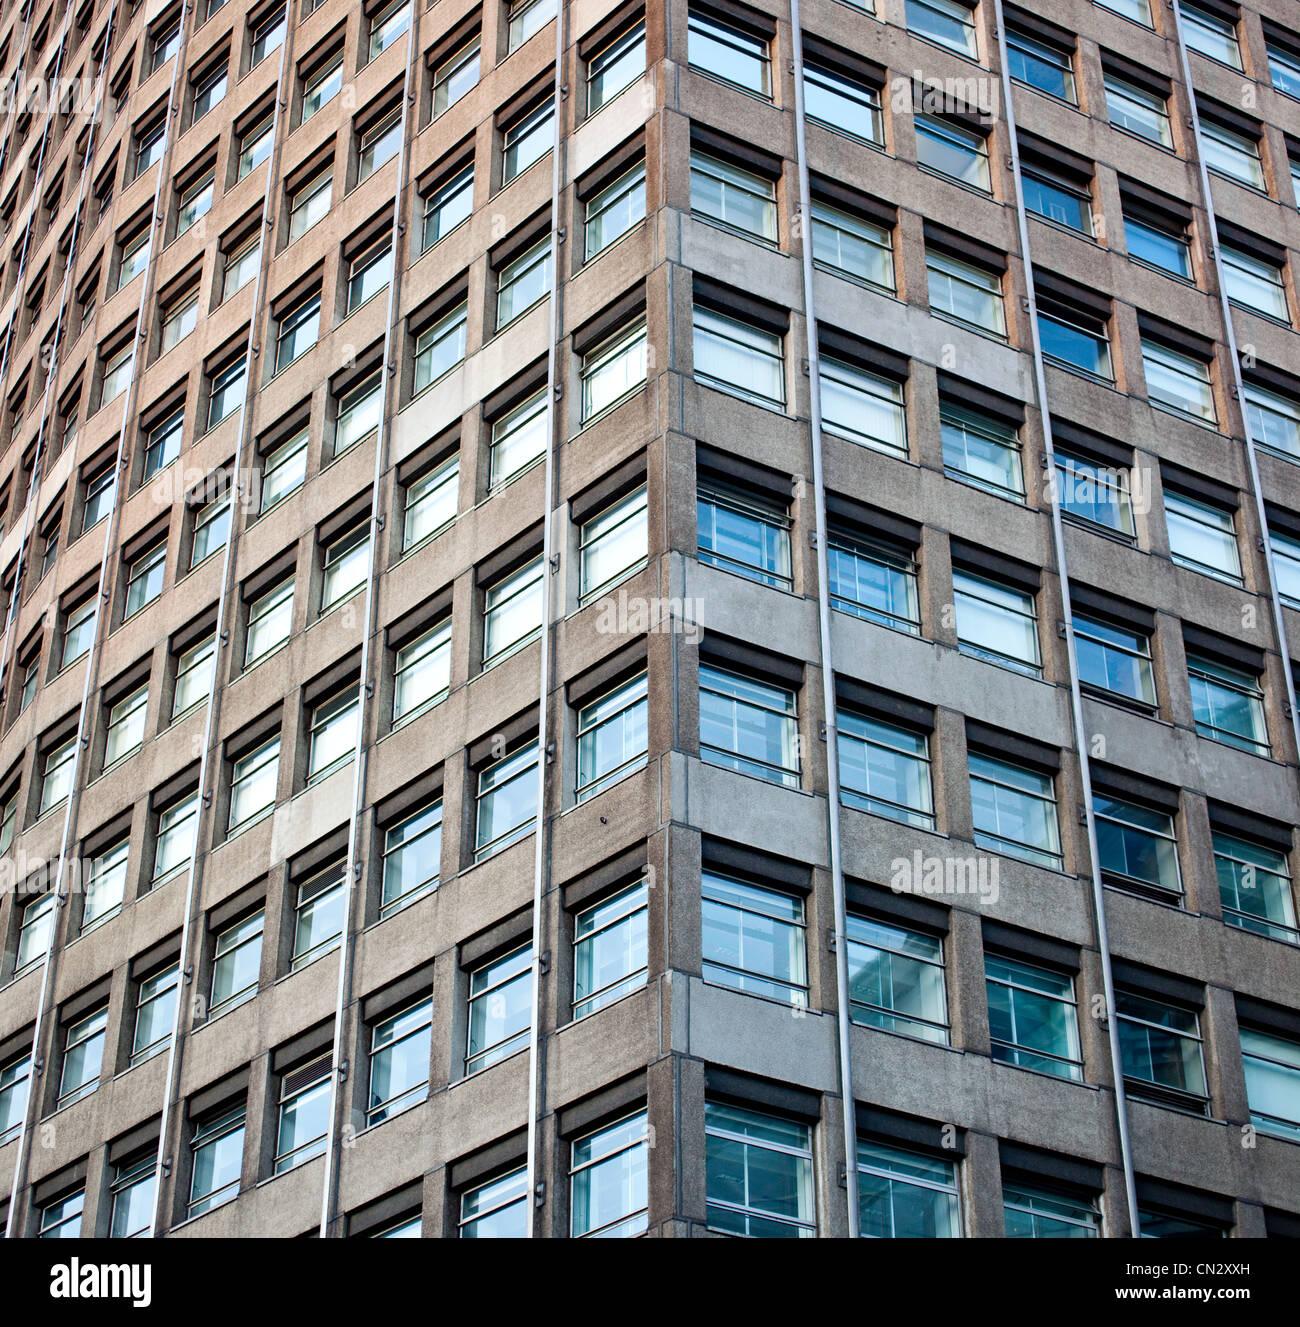 Tower block, London, England - Stock Image